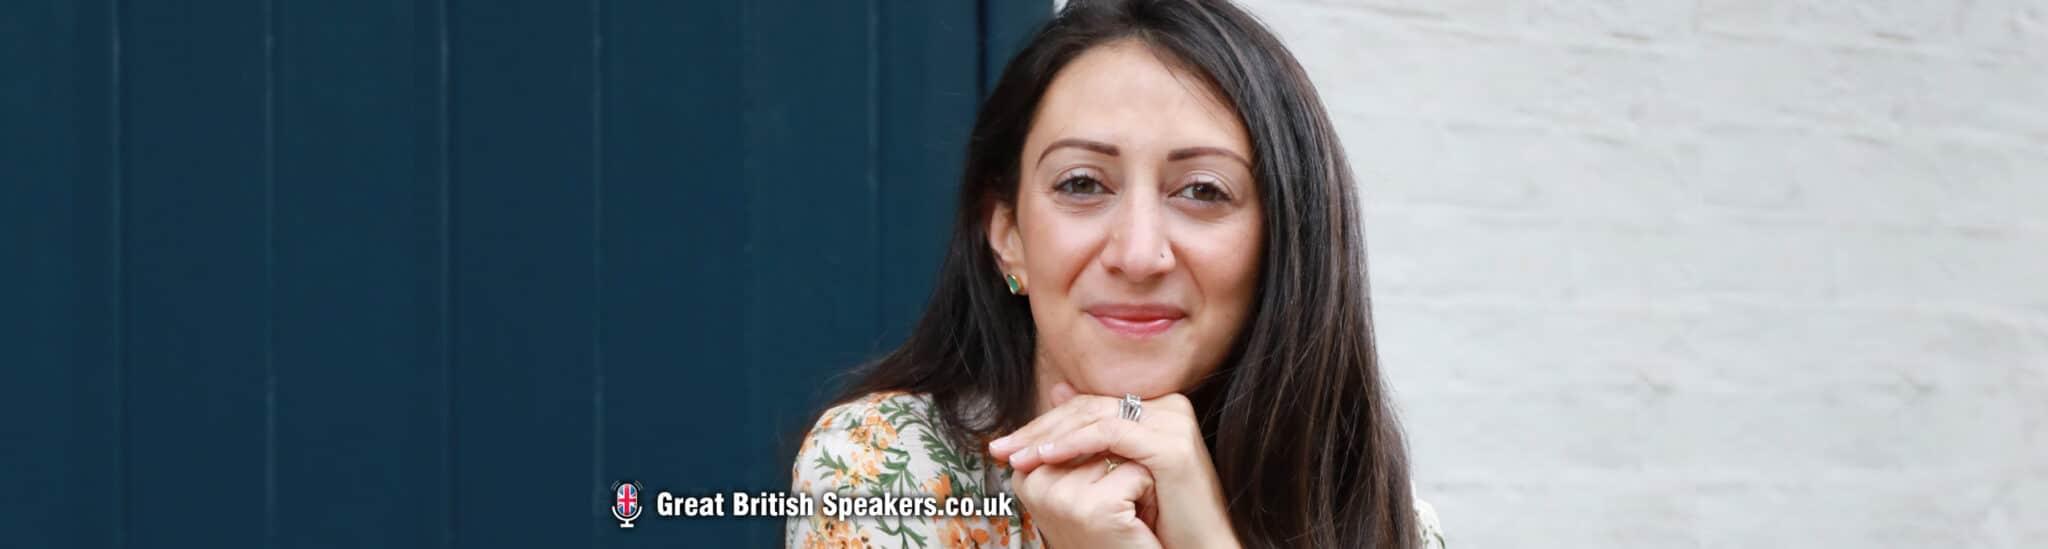 Lauren Vaknine rheumatoid arthritis healthy diet eating wellness expert blogger writer influencer at Great British Speakers